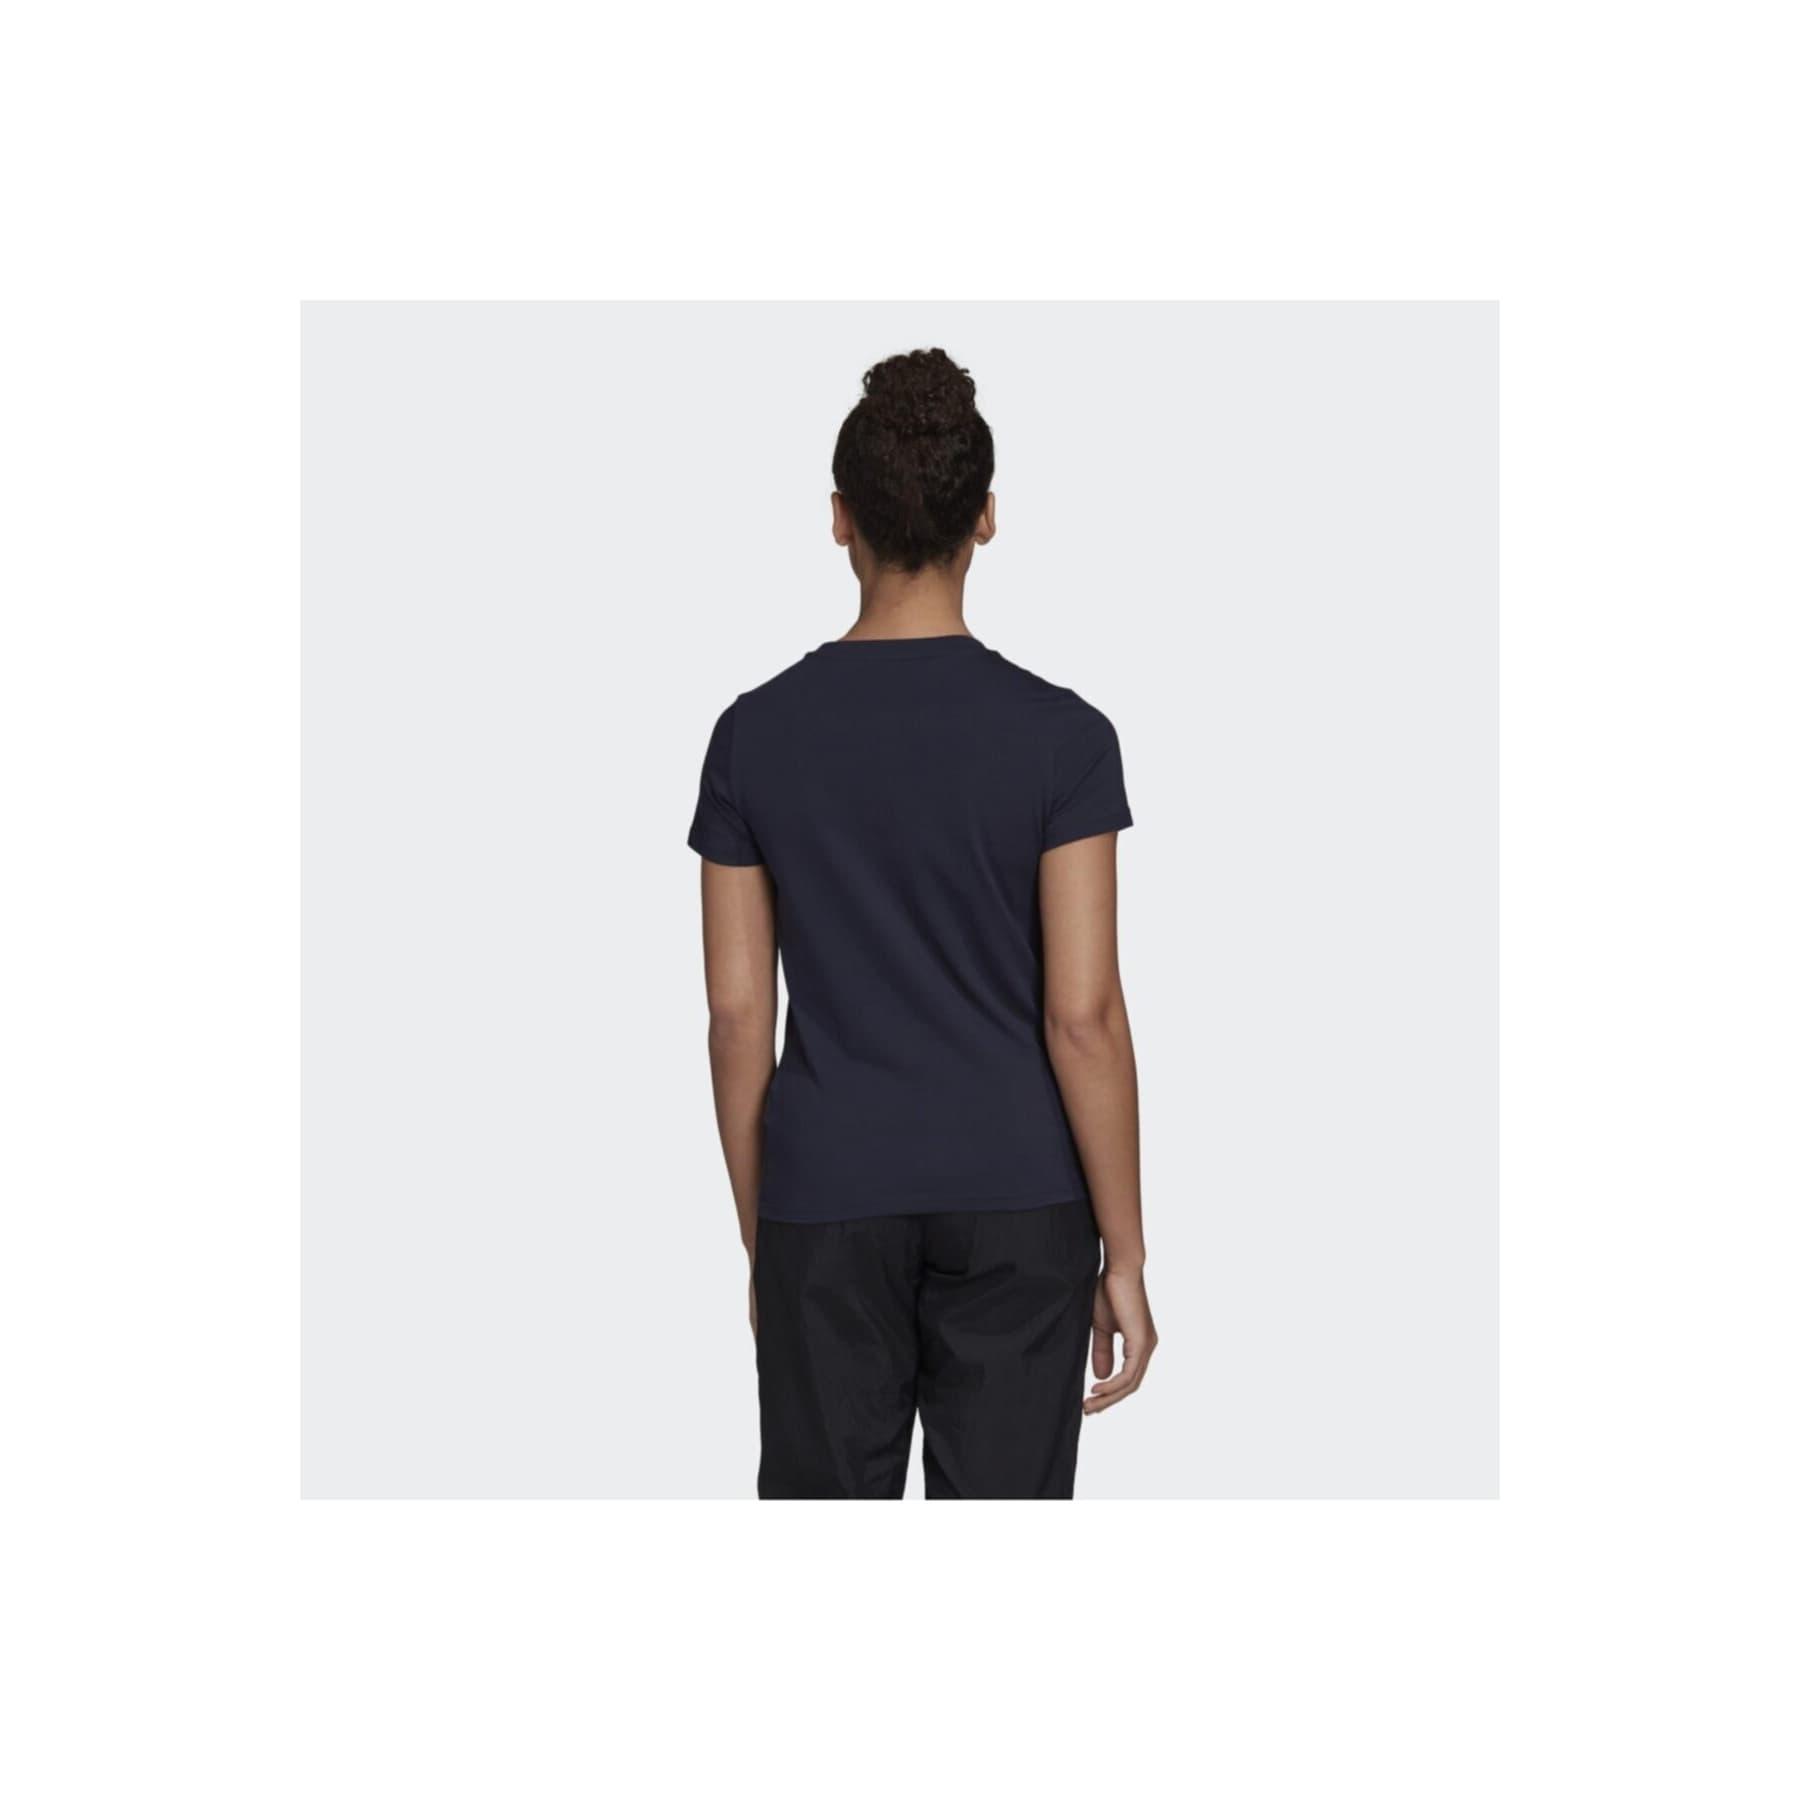 Essentials Linear Kadın Lacivert Spor Tişört